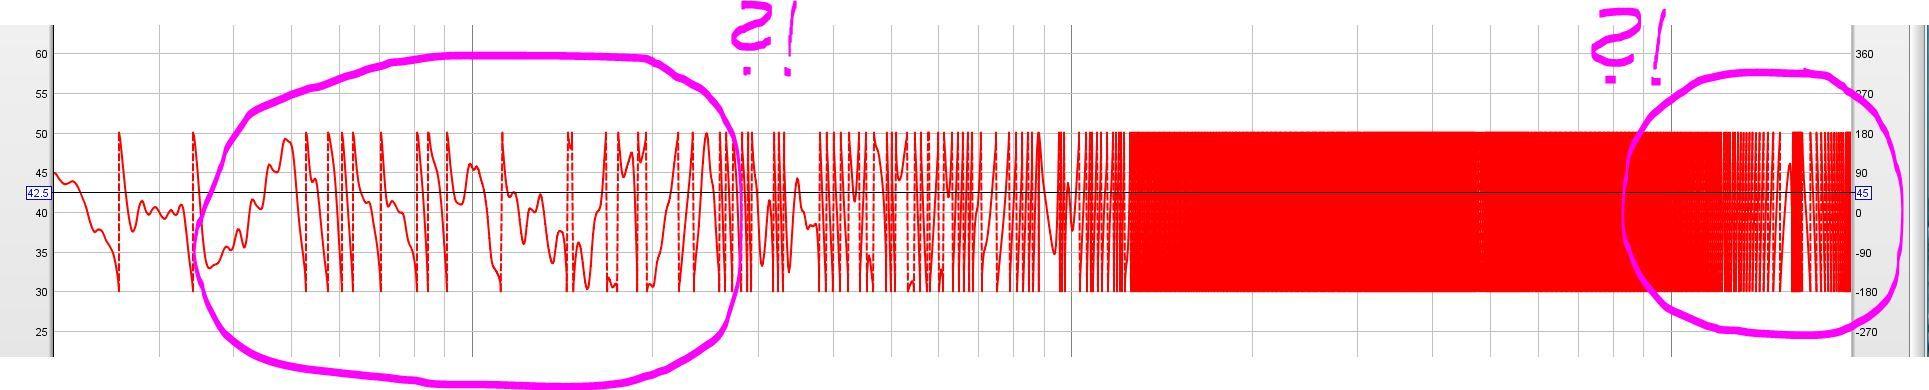 Sine-sweep graph - Not a sine wave.JPG